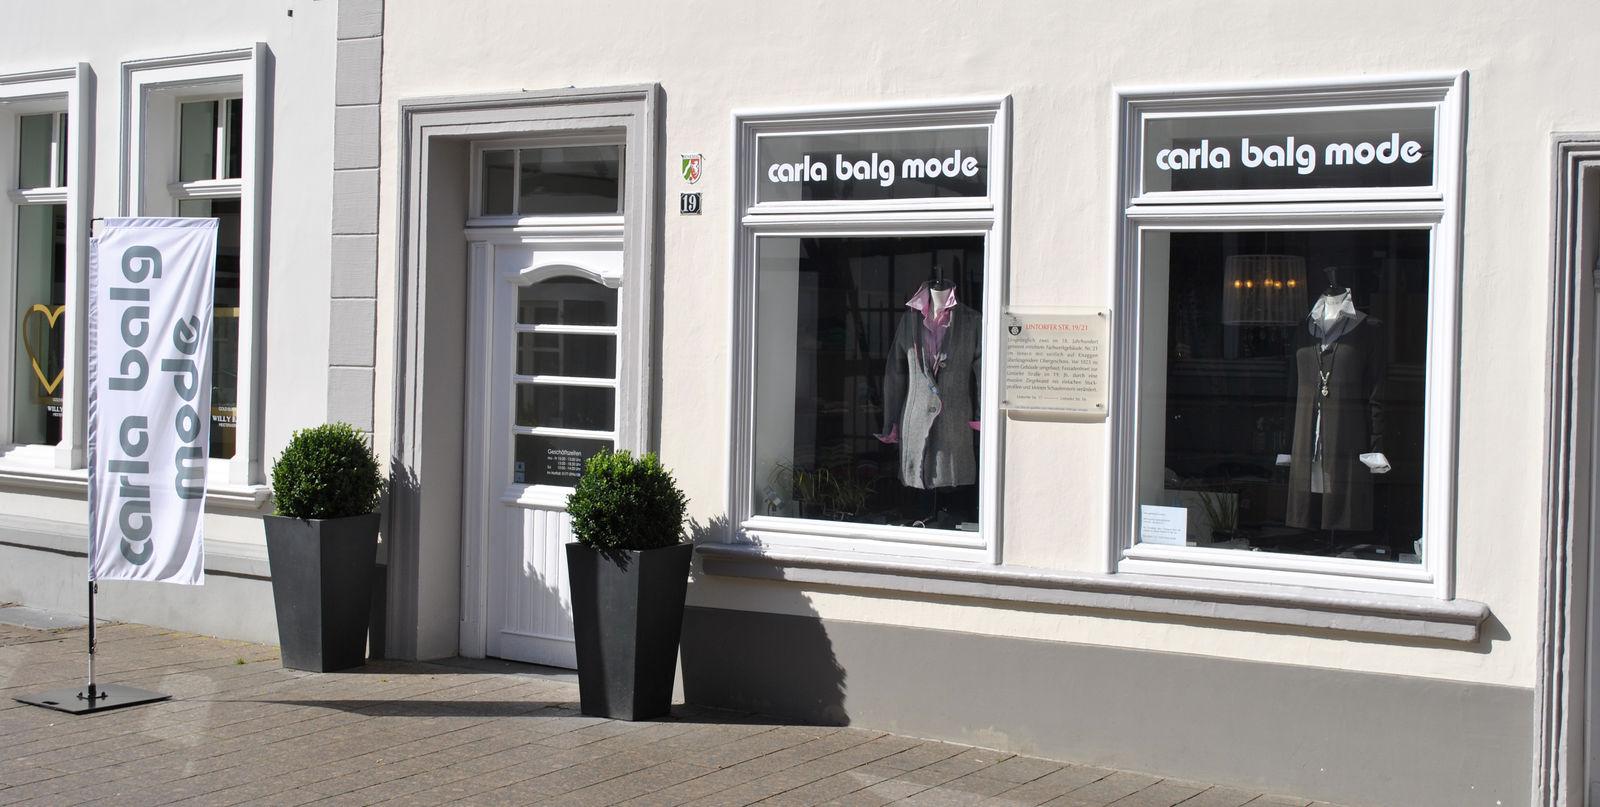 Carla Balg Mode in Ratingen (Bild 3)